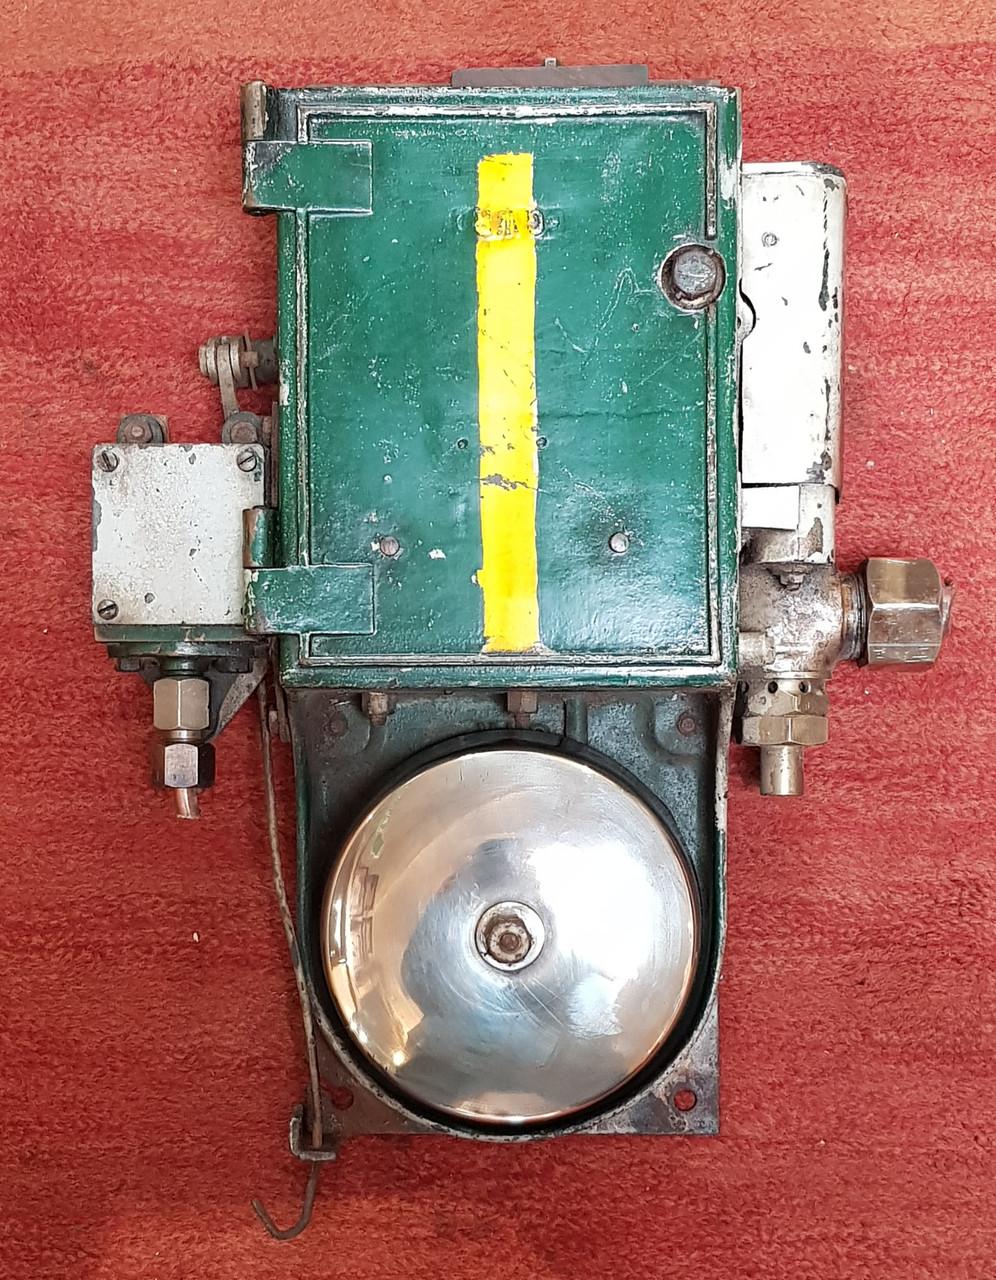 VT 3351. G.W.R. LOCOMOTIVE CAB WARNING BELL APPARATUS